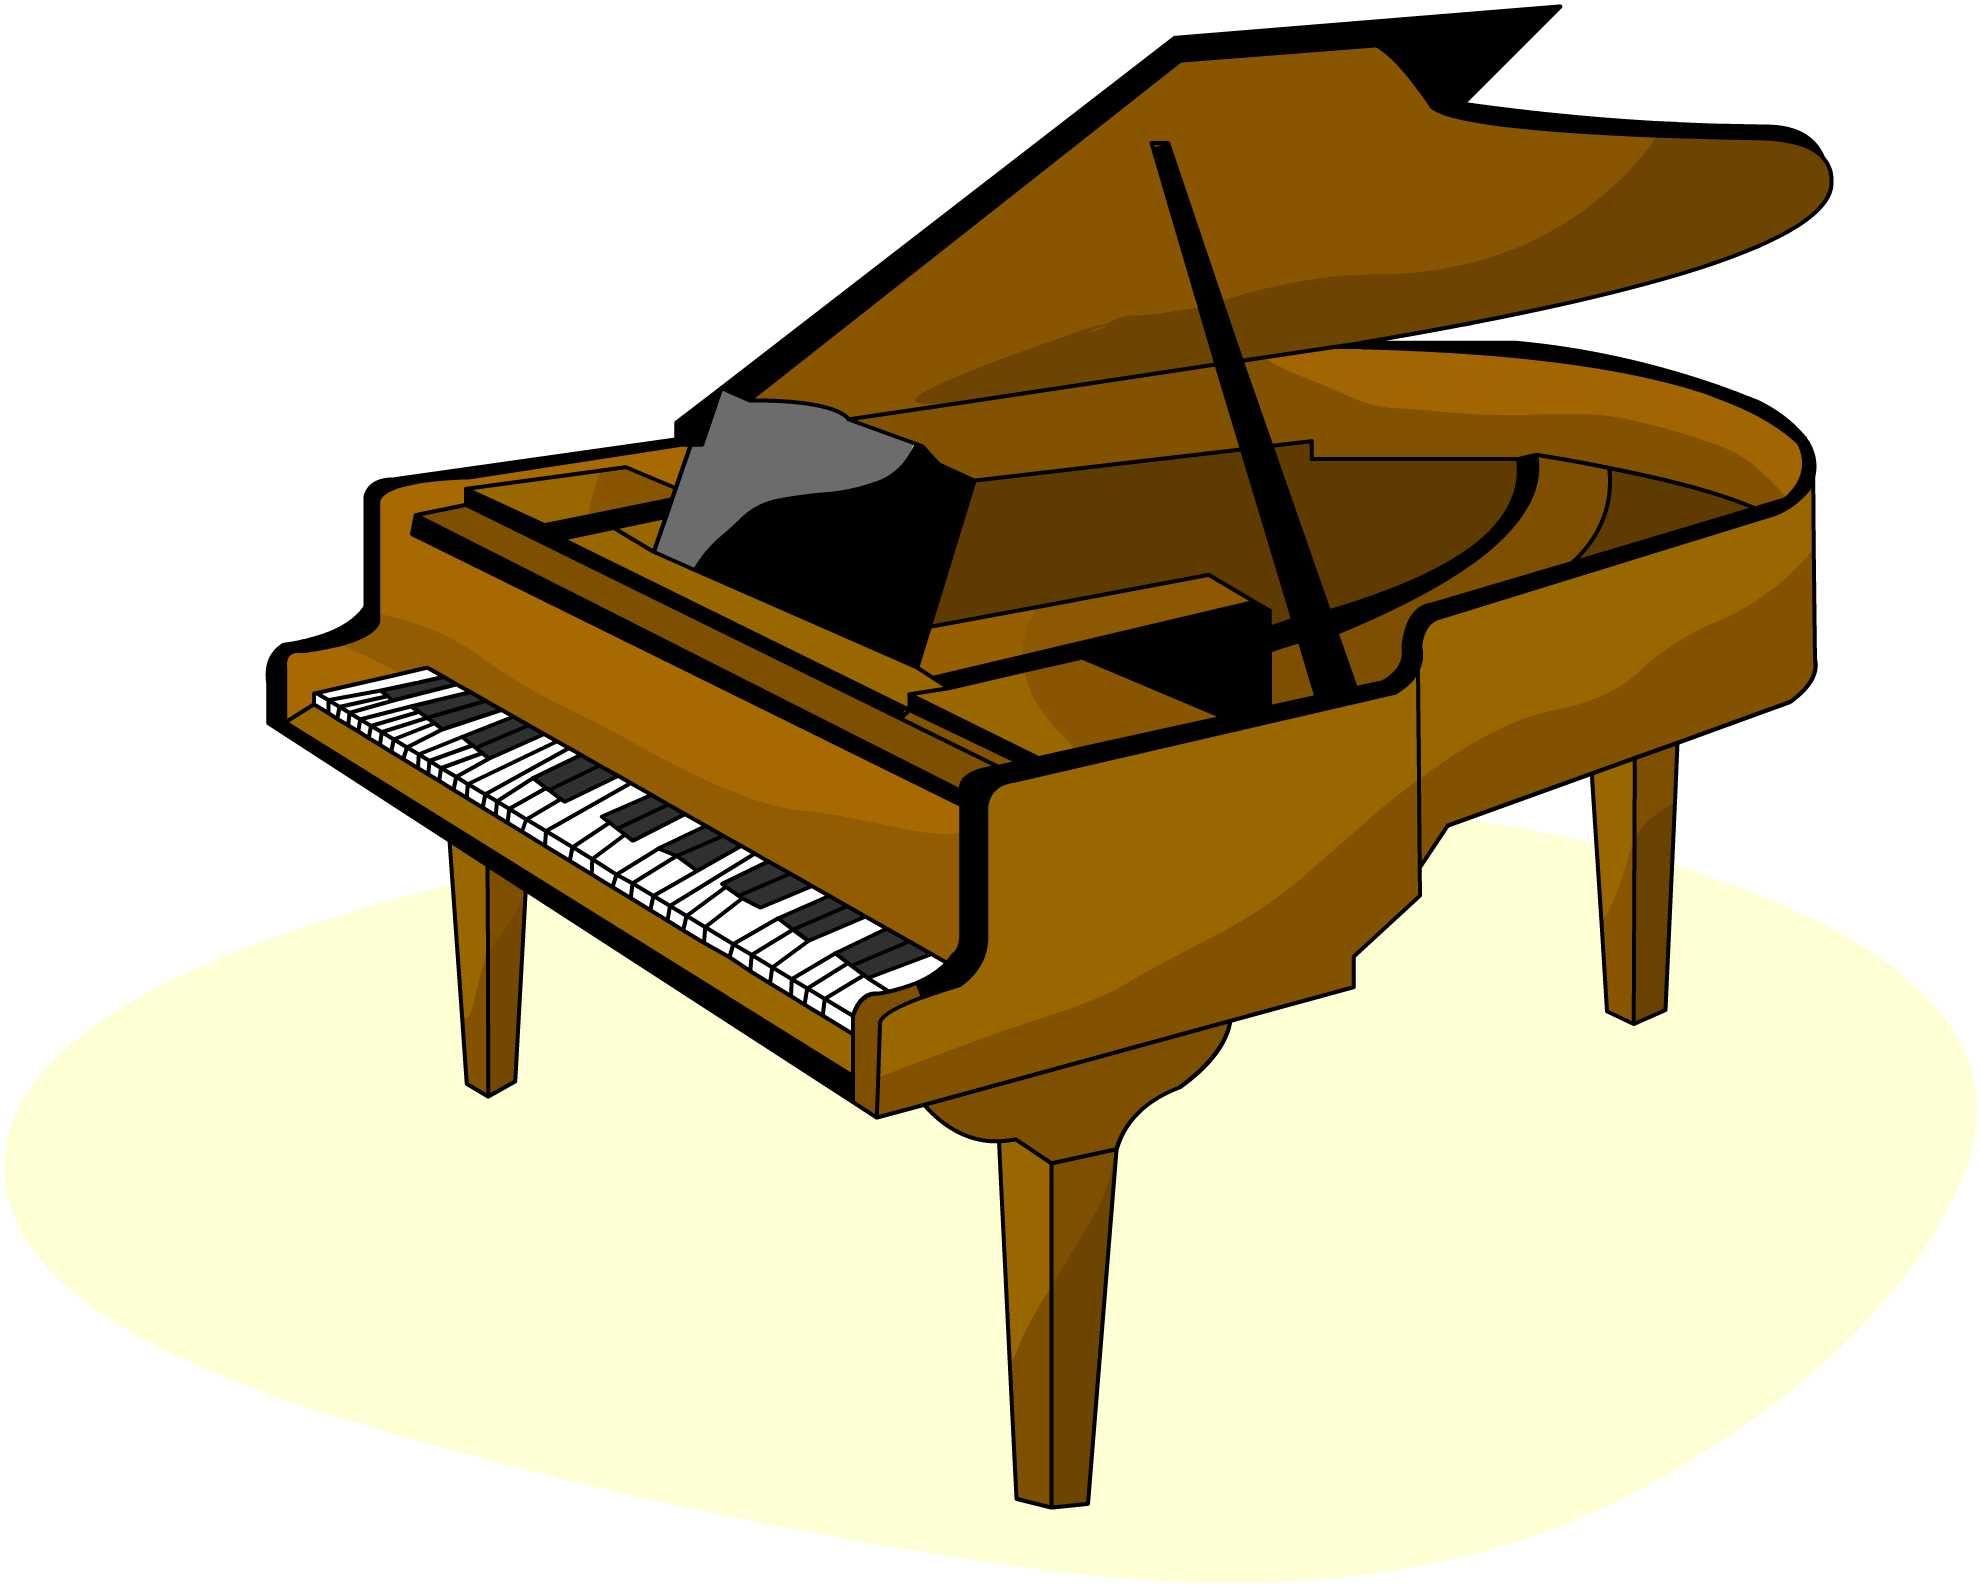 Clipart piano gratuit banner stock Clipart piano gratuit - ClipartFest banner stock